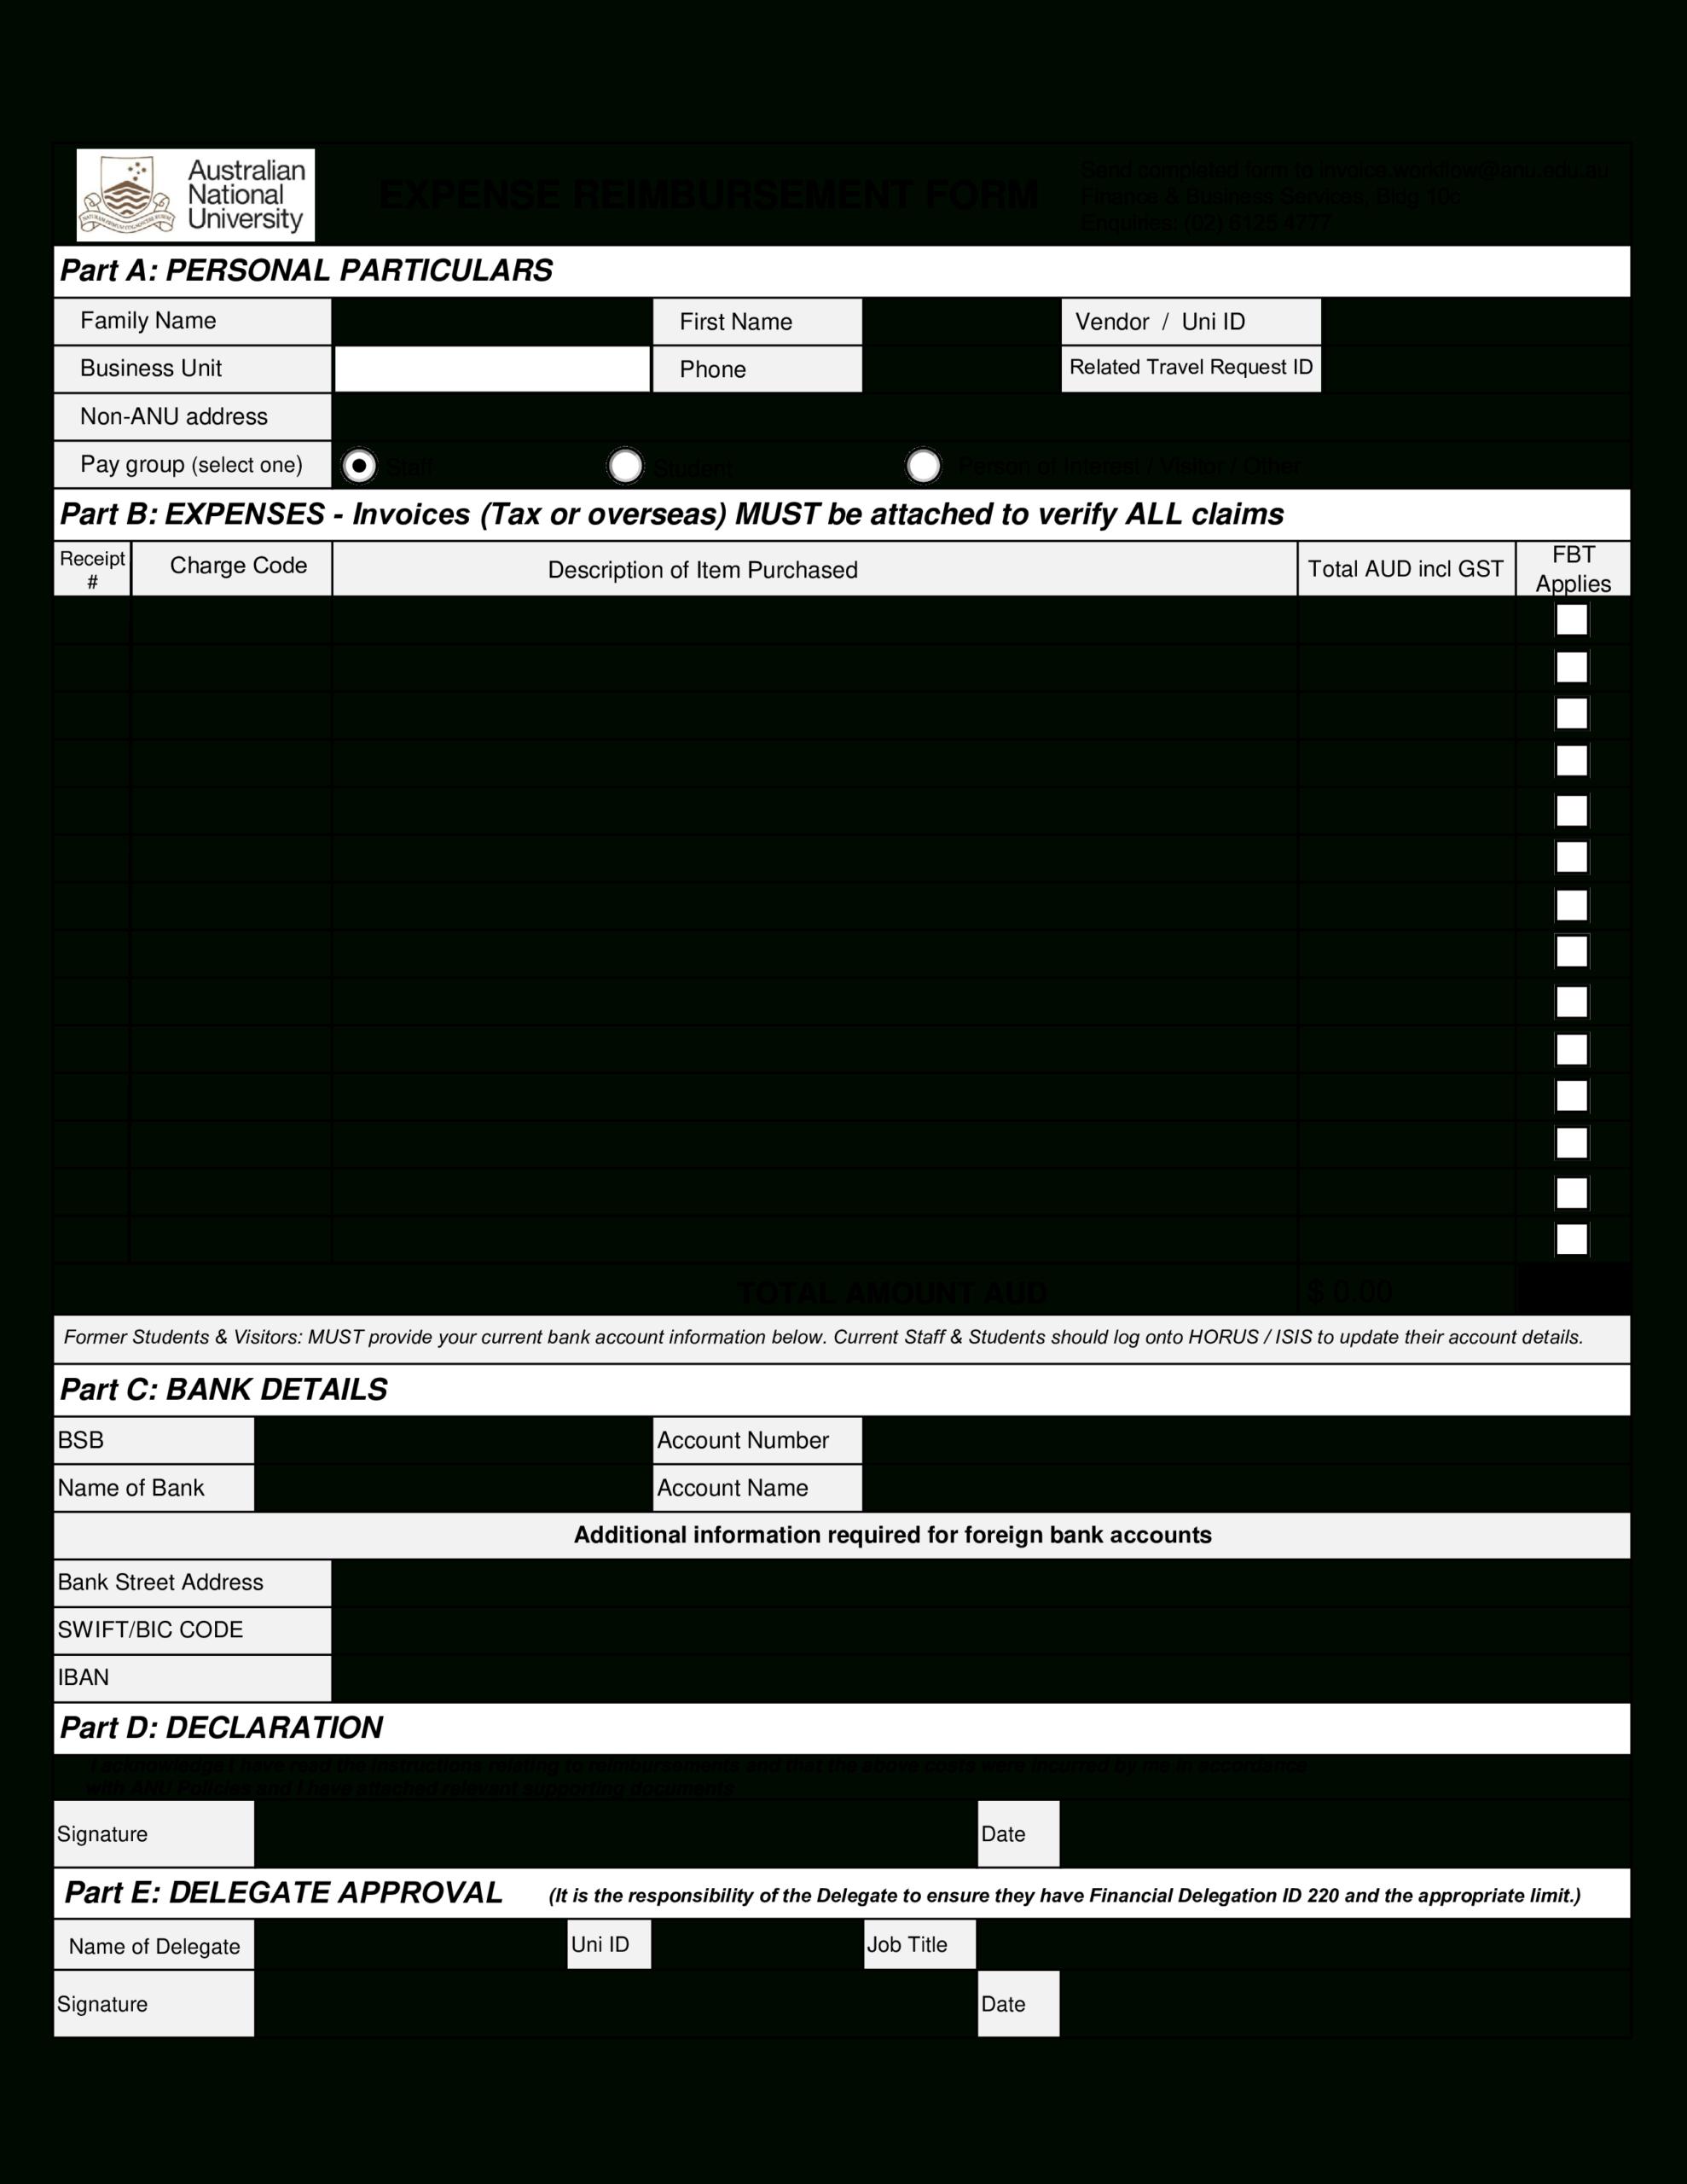 Reimbursement Form Template - Zohre.horizonconsulting.co For Reimbursement Form Template Word